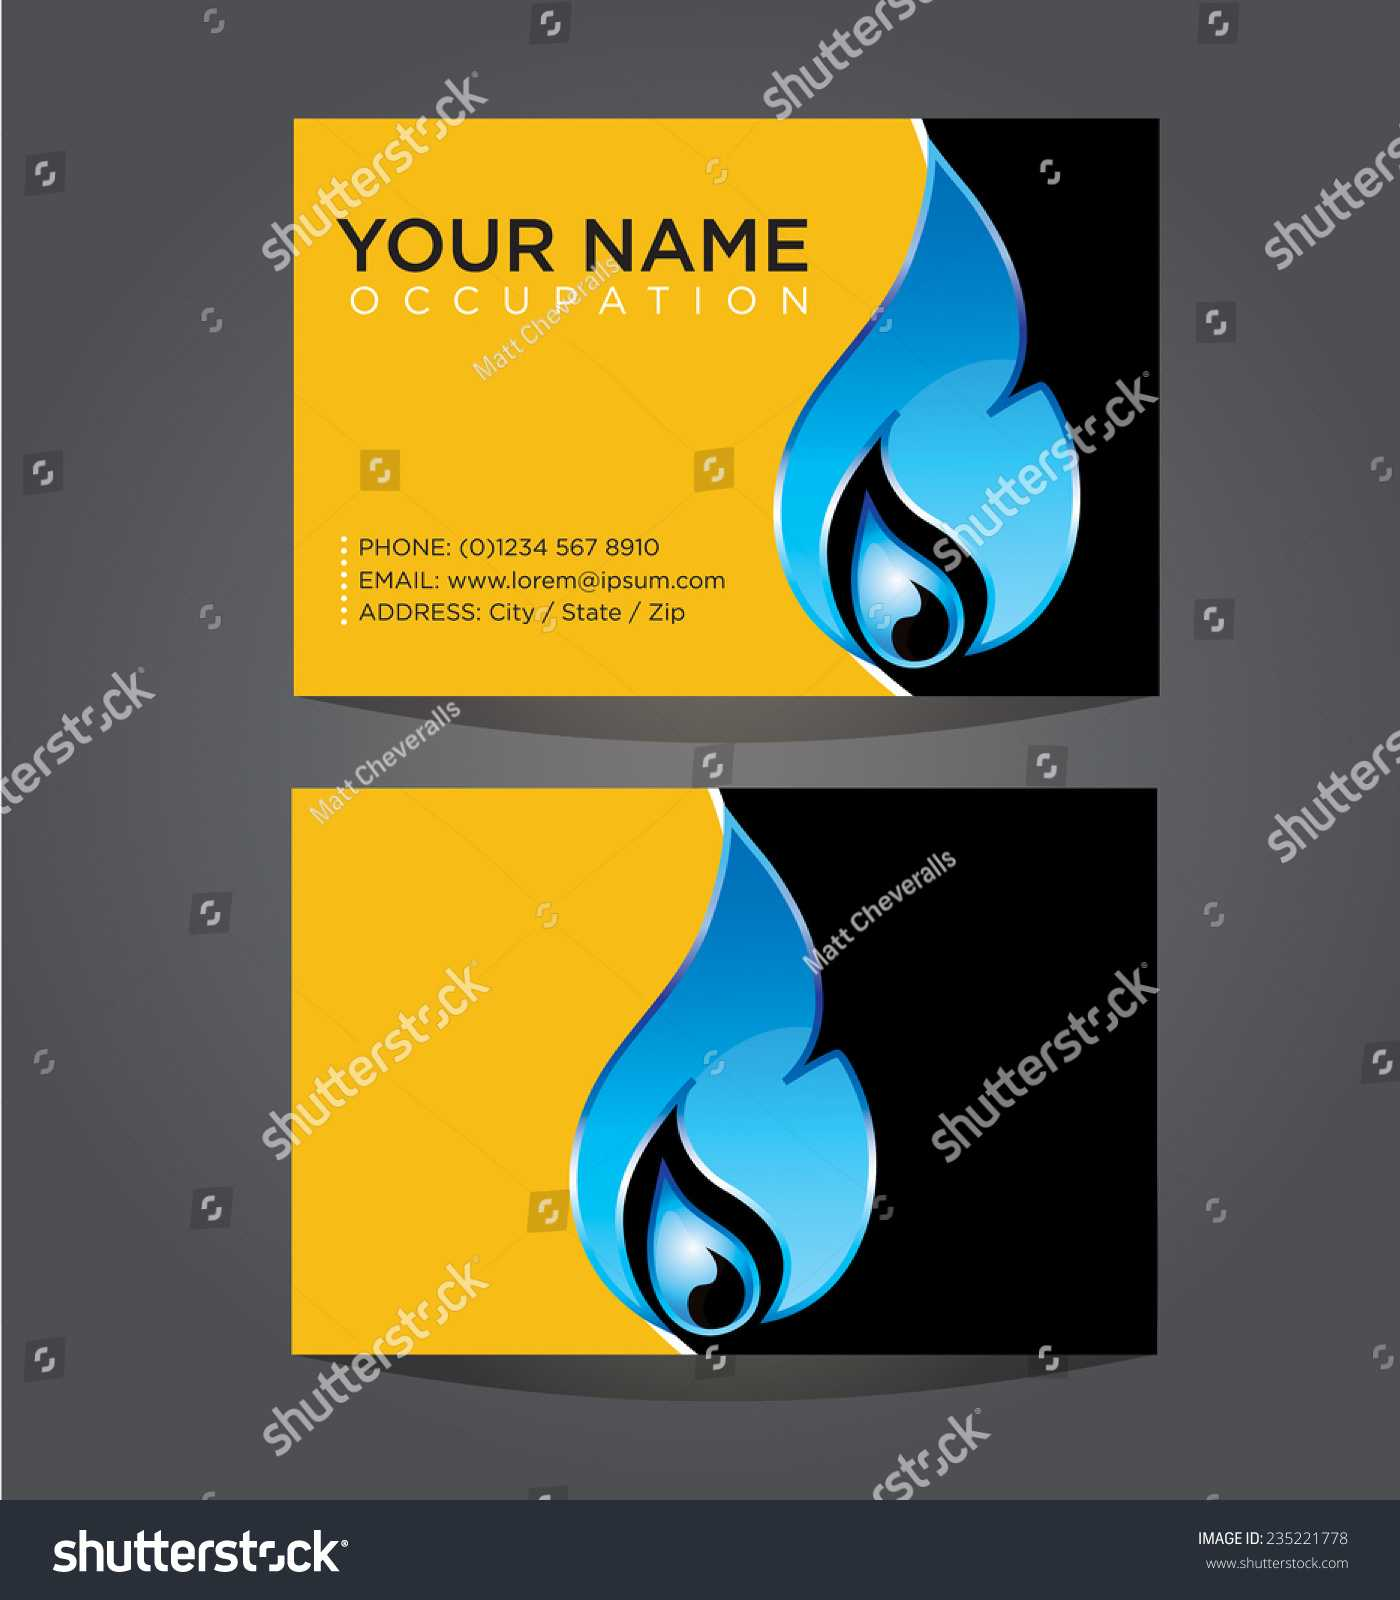 Business Card Template Plumbing Heating Air Stock Vector Throughout Hvac Business Card Template